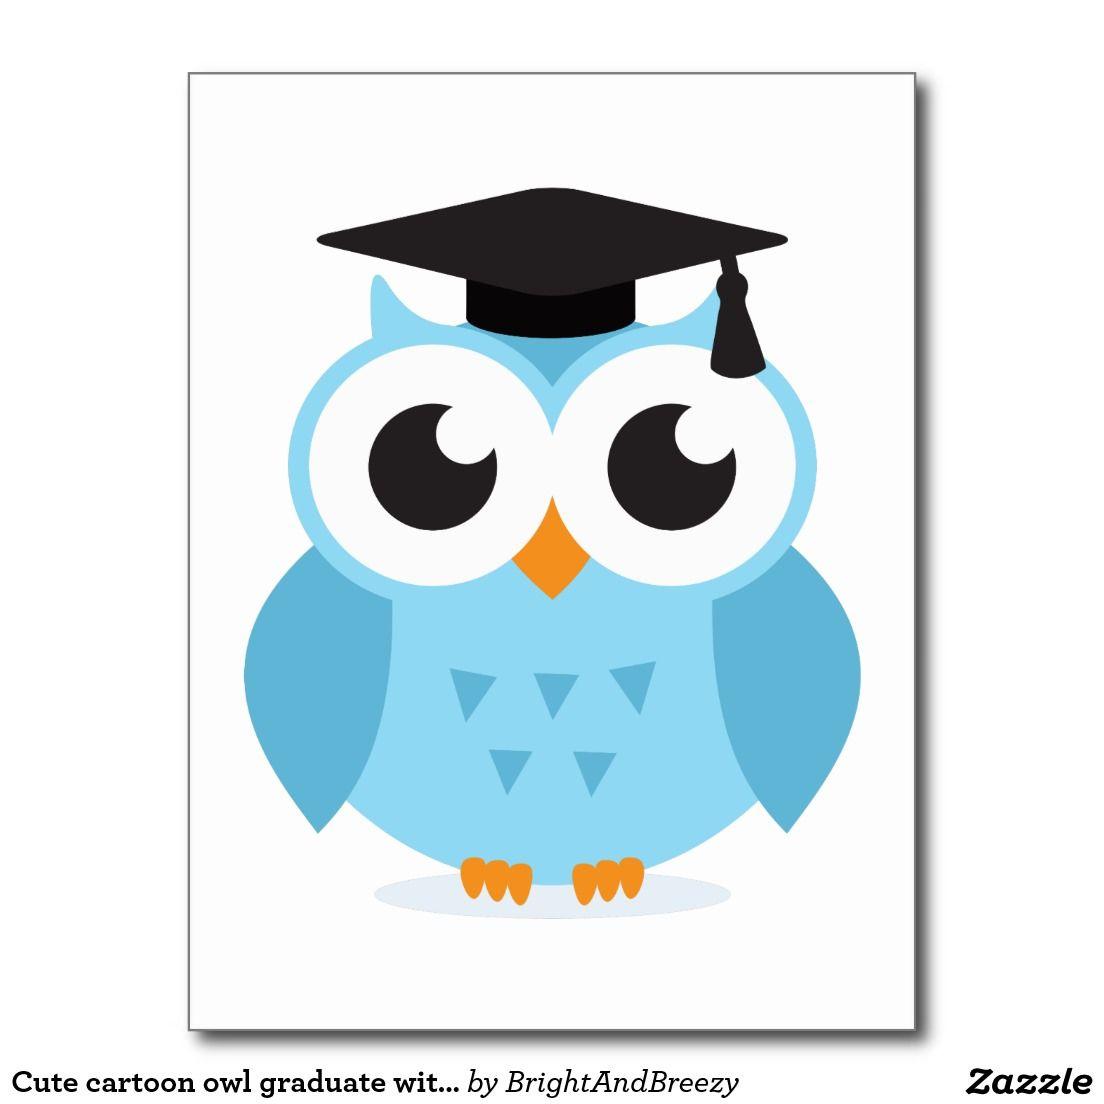 hd owls graduation - Buscar con Google